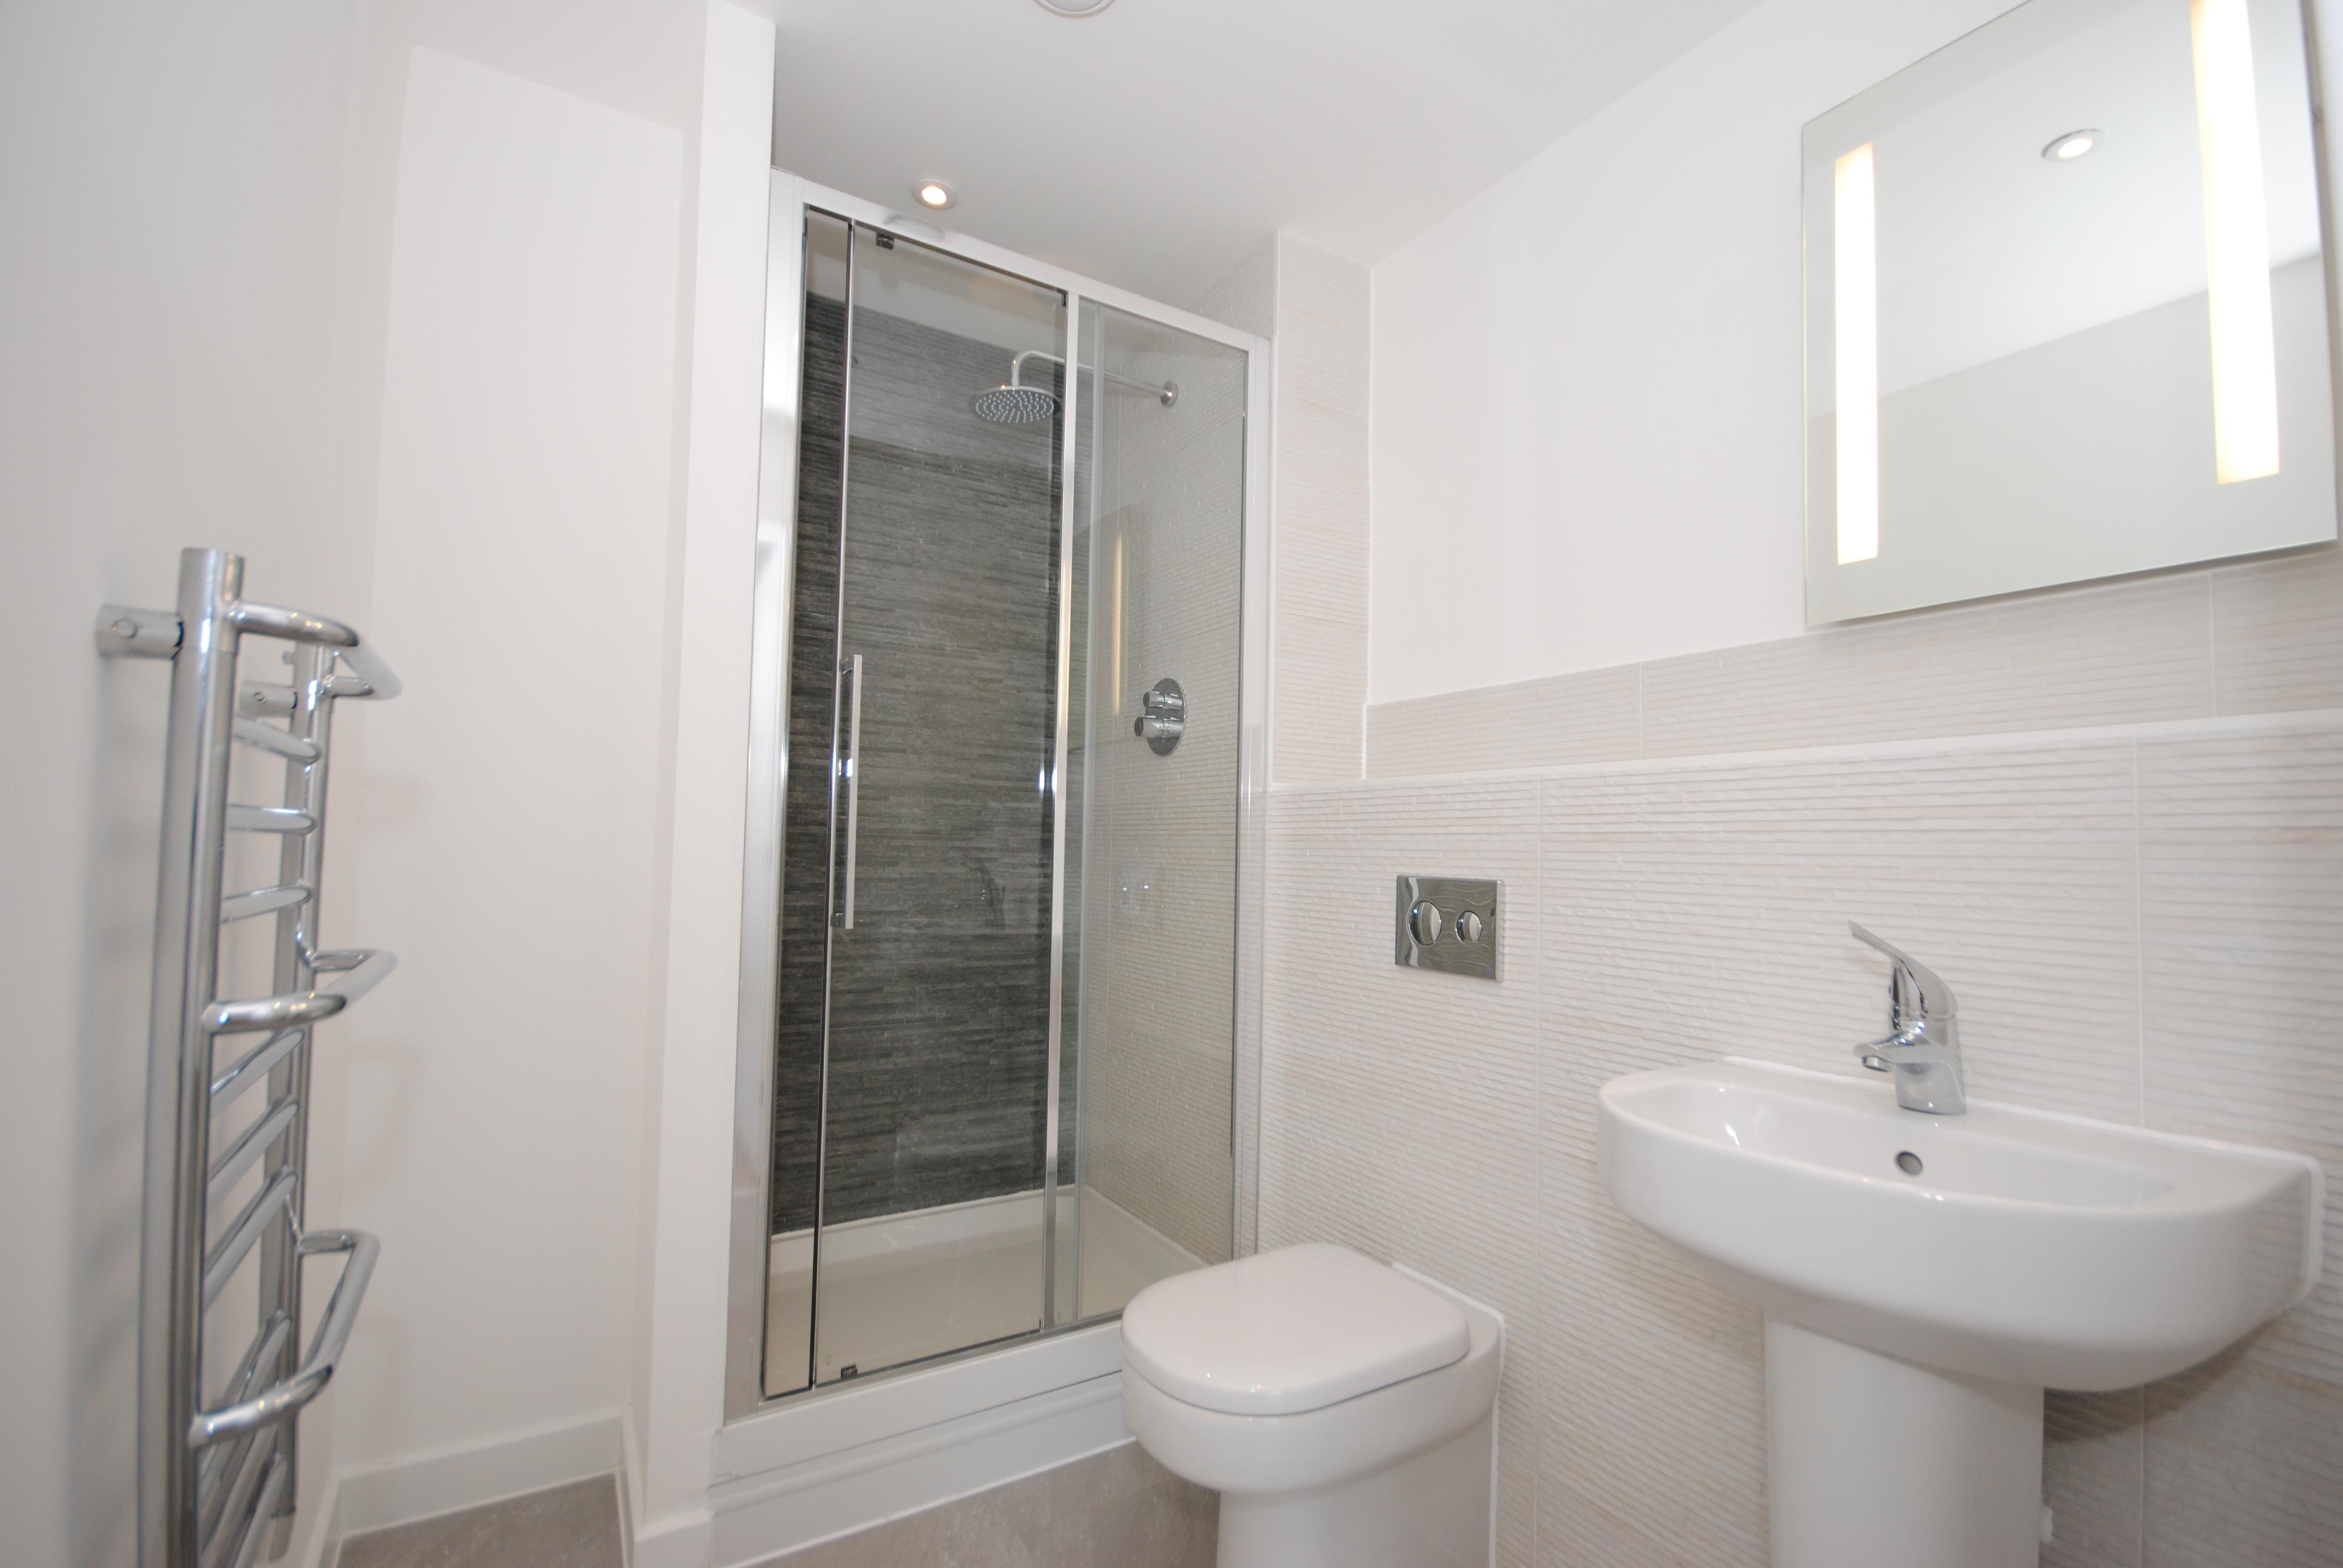 Beautiful Gemini Bathroom Tiles Picture Collection - Bathroom Design ...